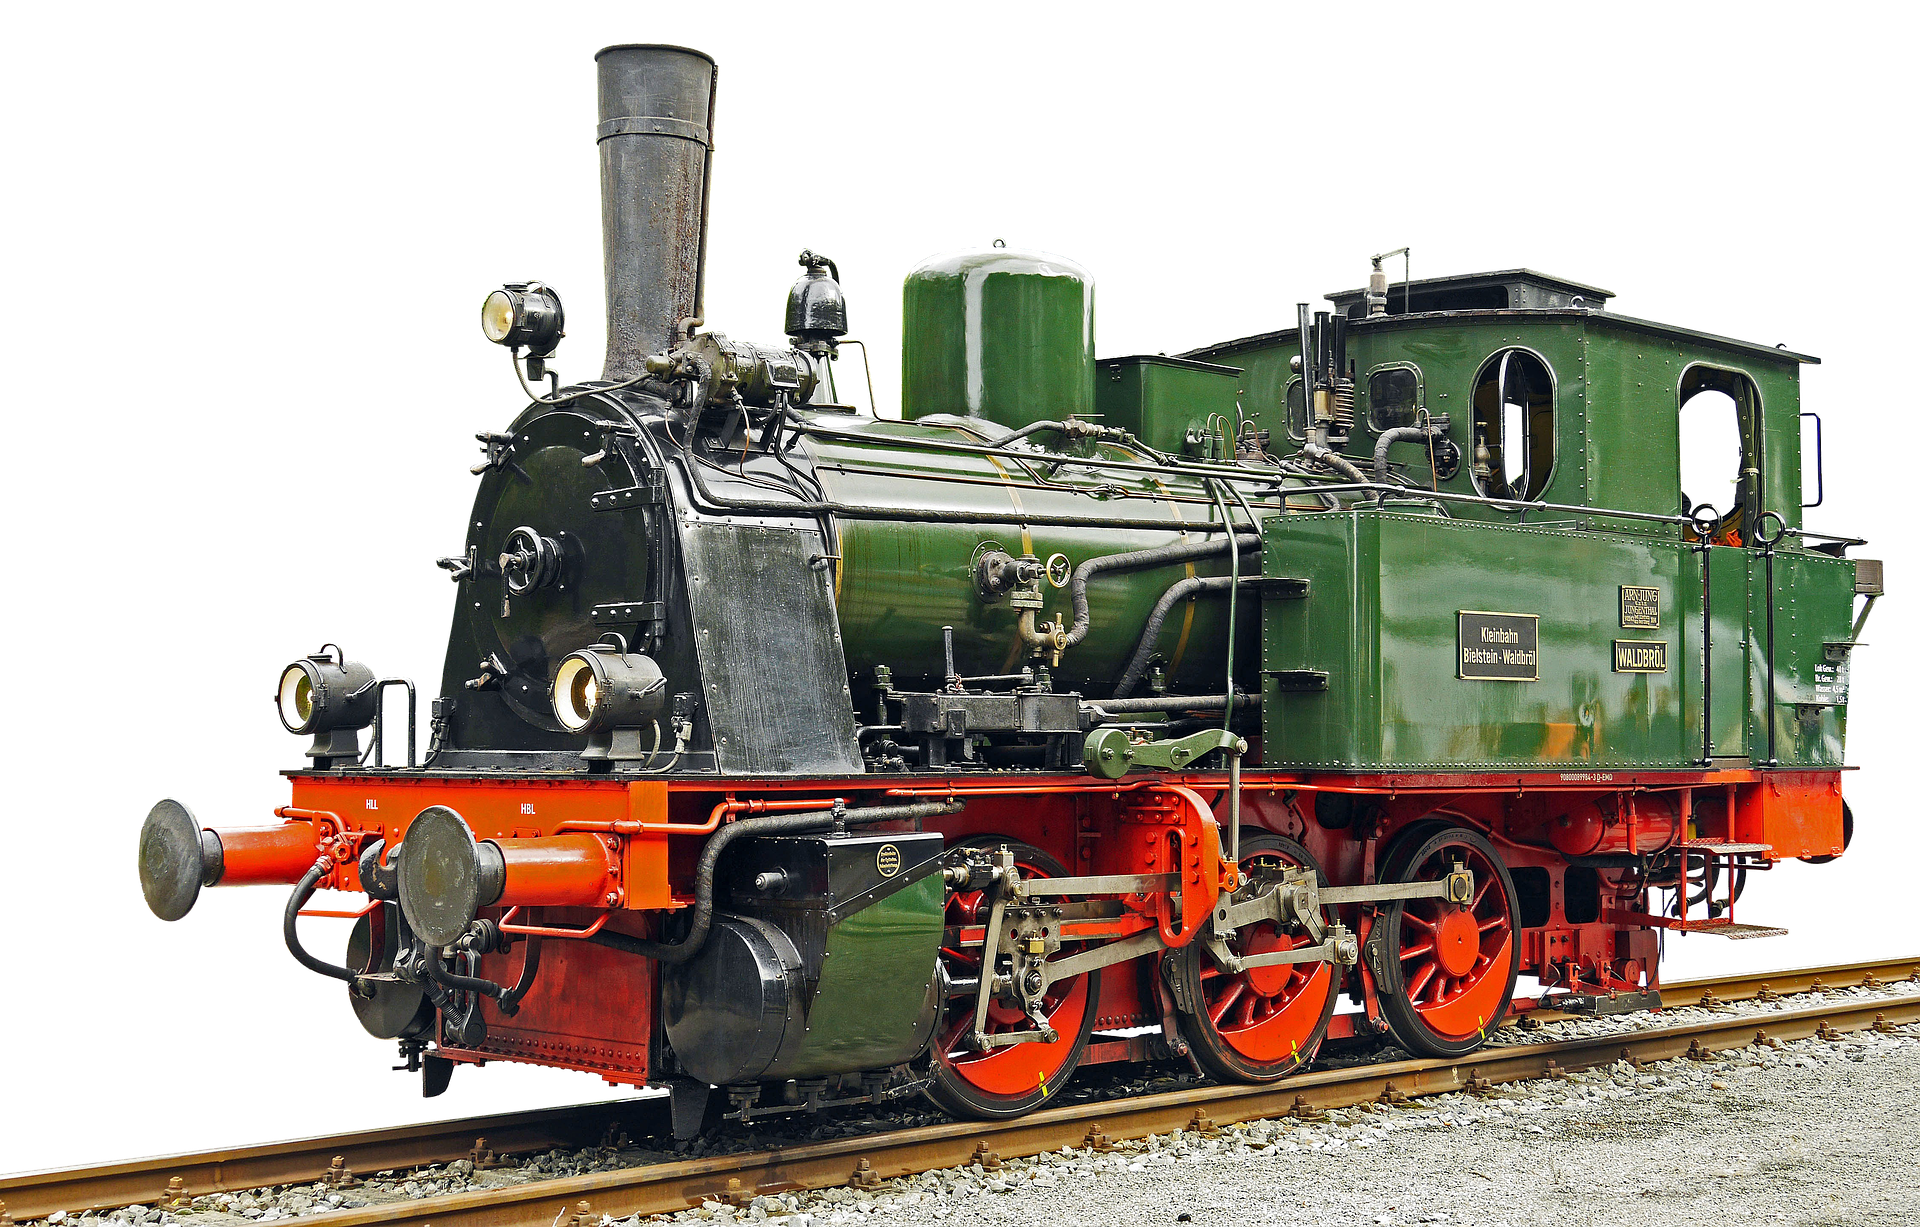 locomotive-2933778_1920